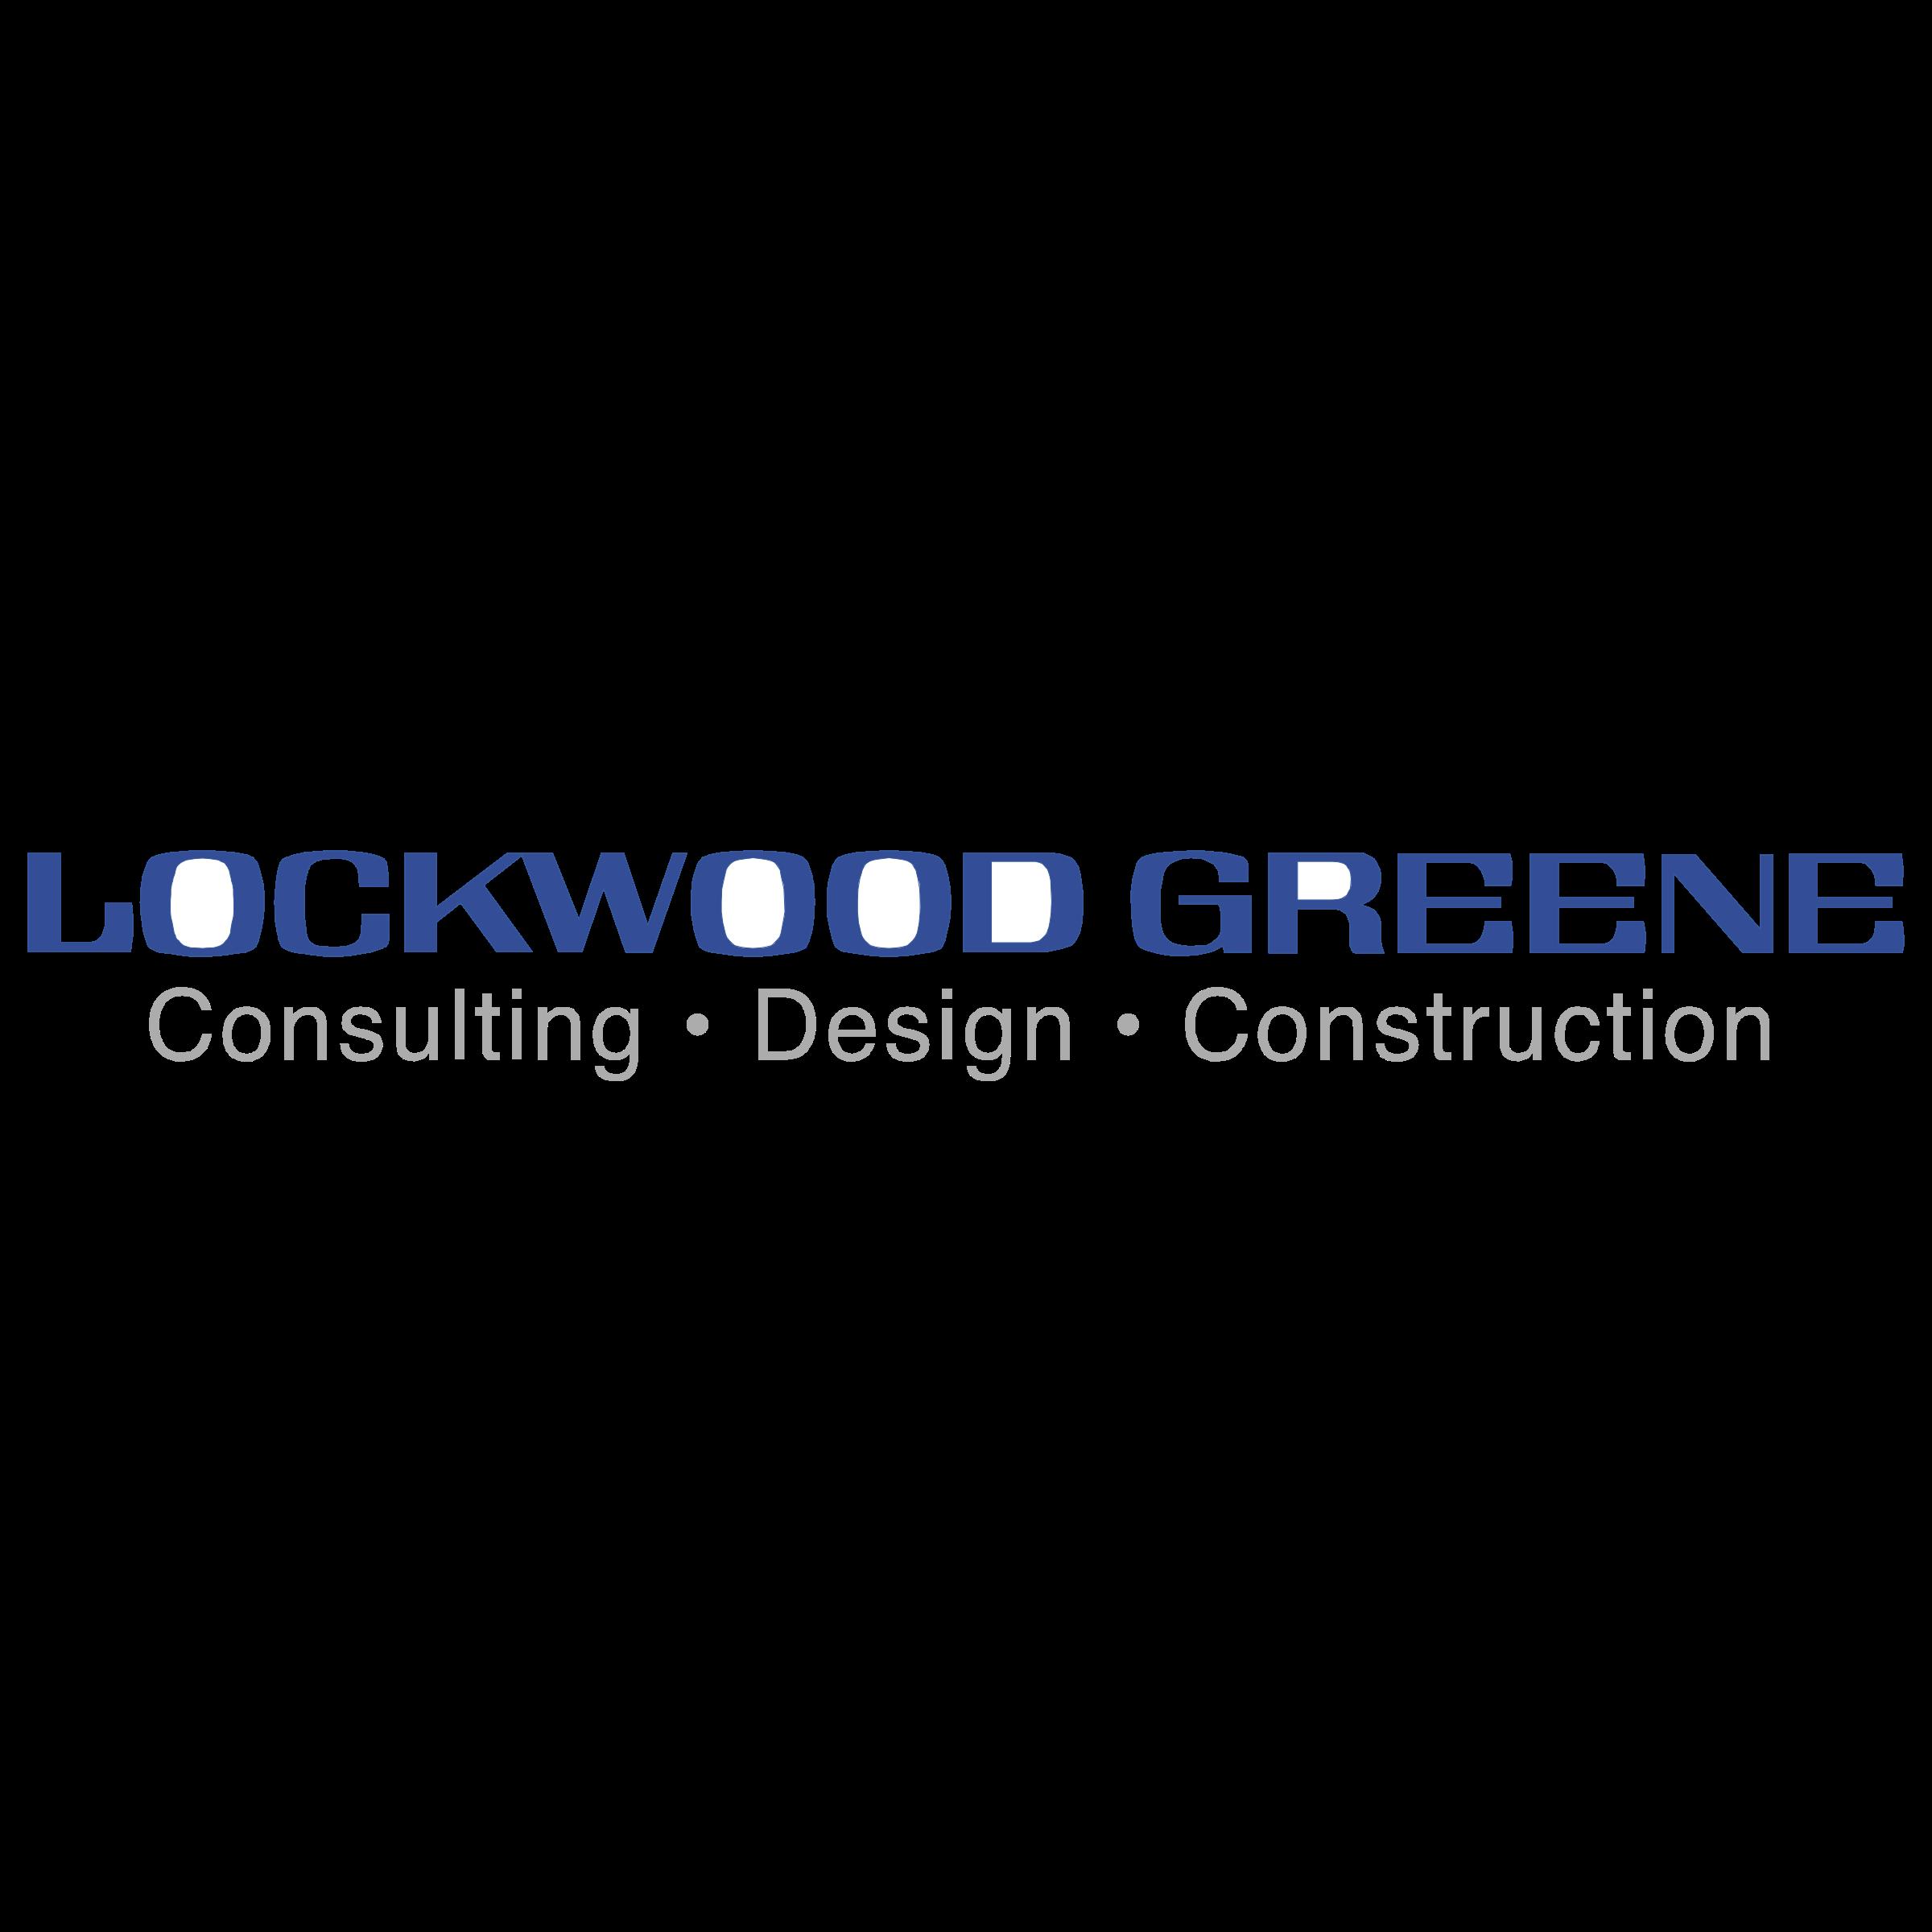 Lockwood Greene logo